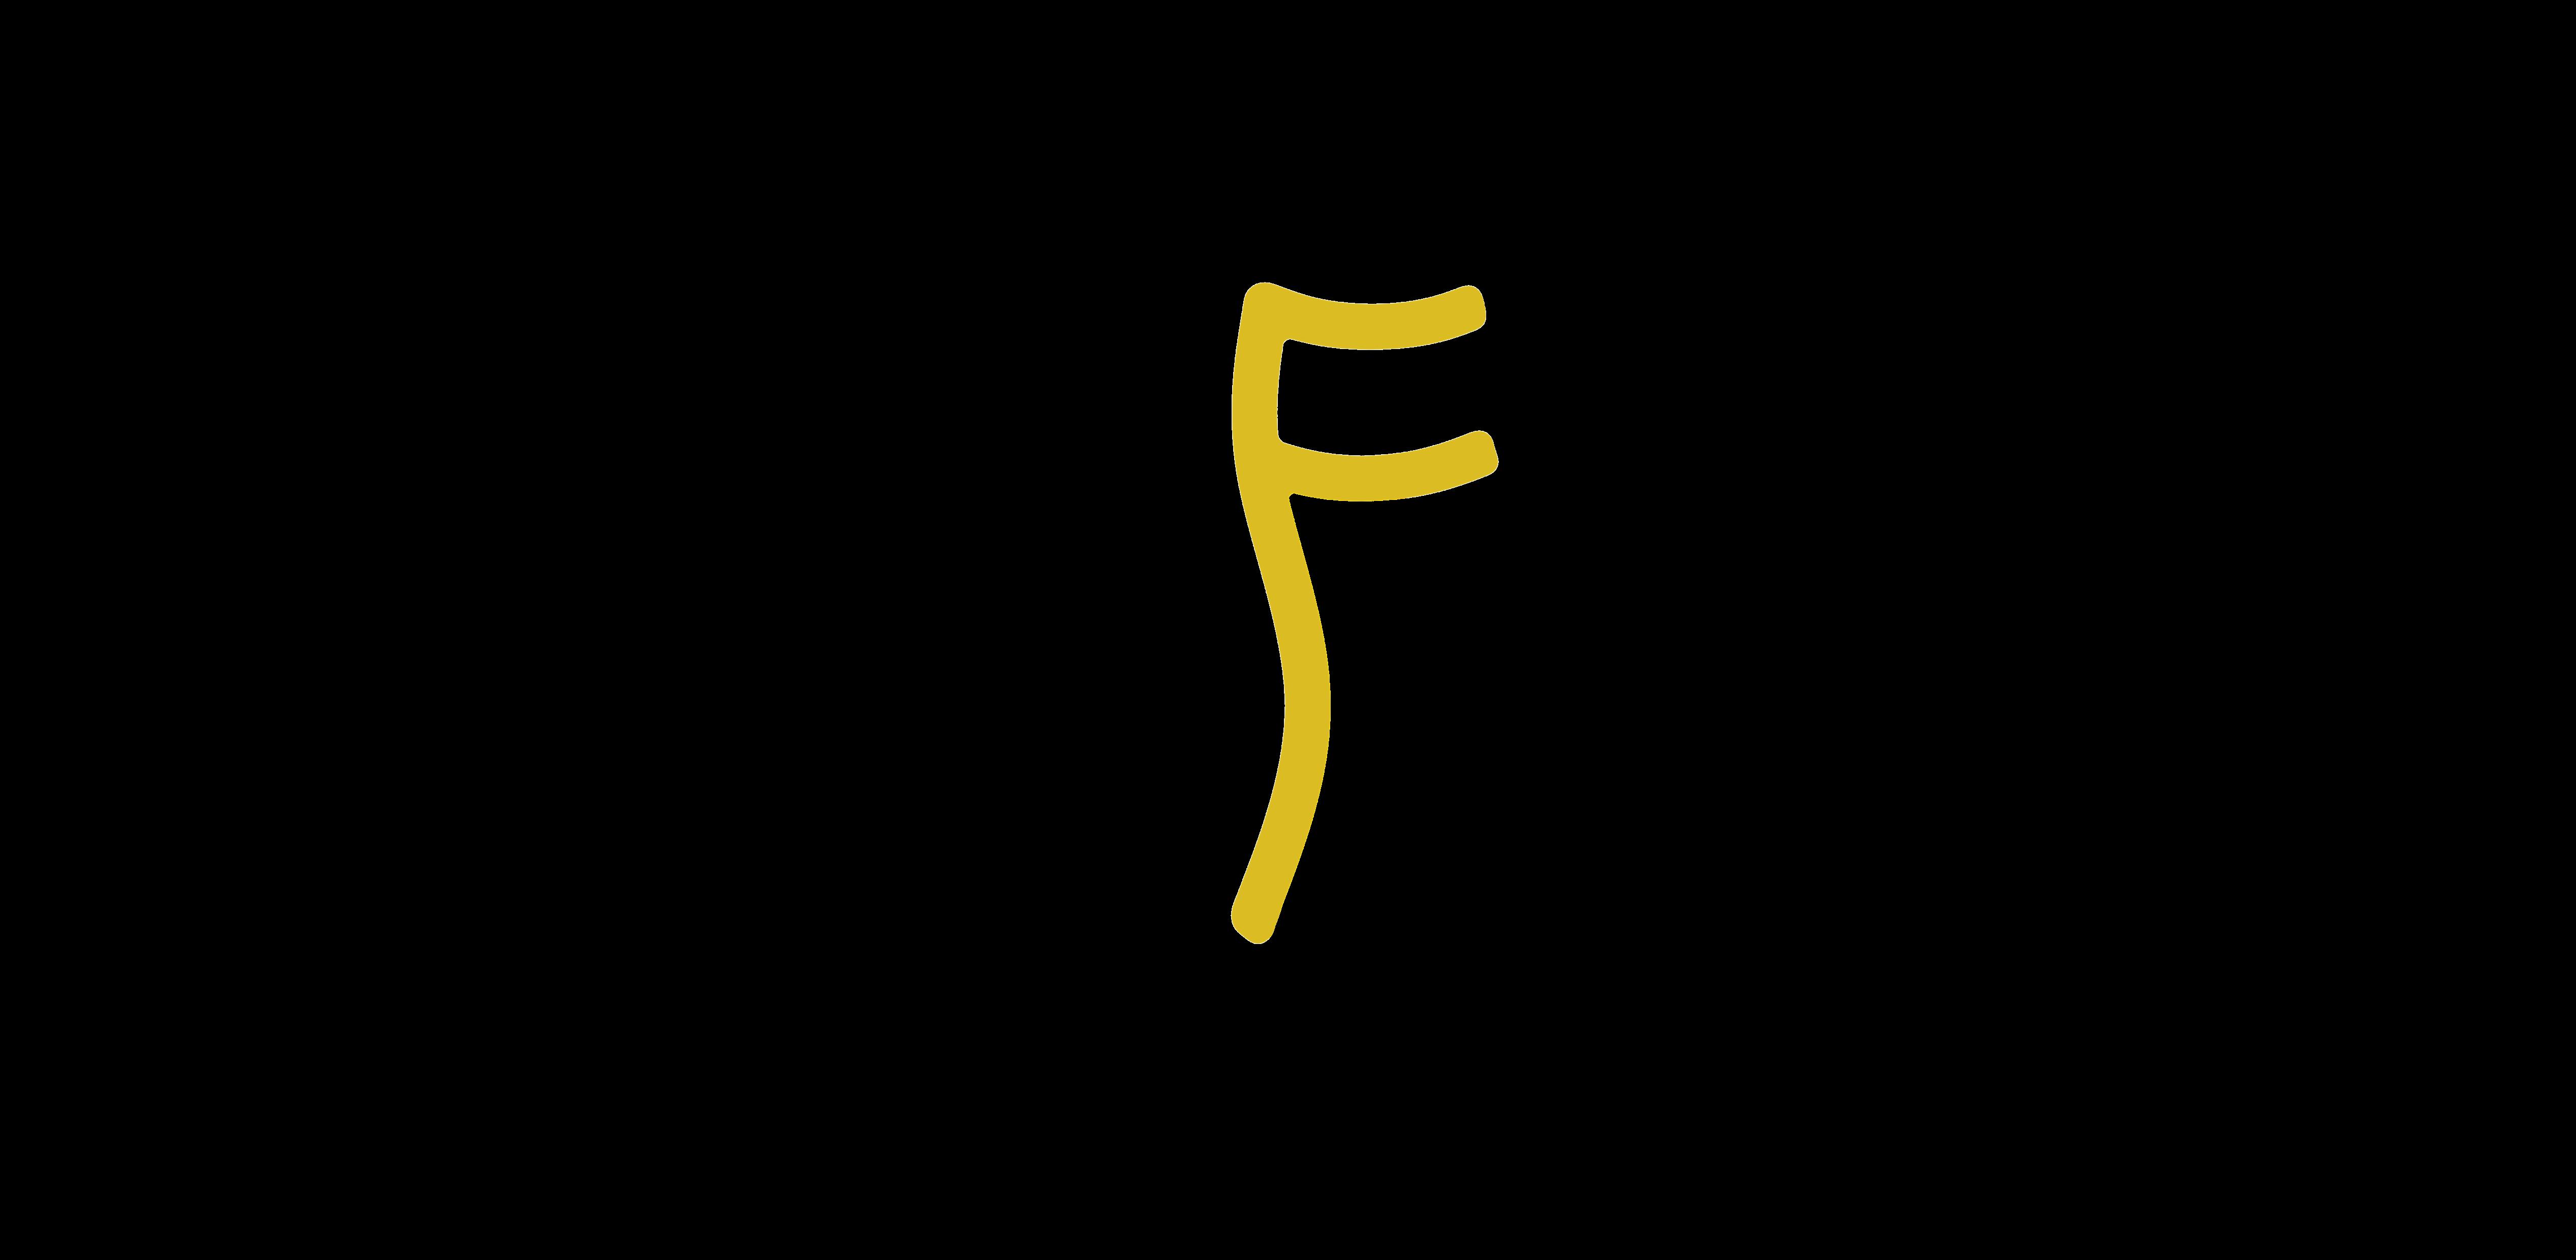 V.f.b. Freude e.V.